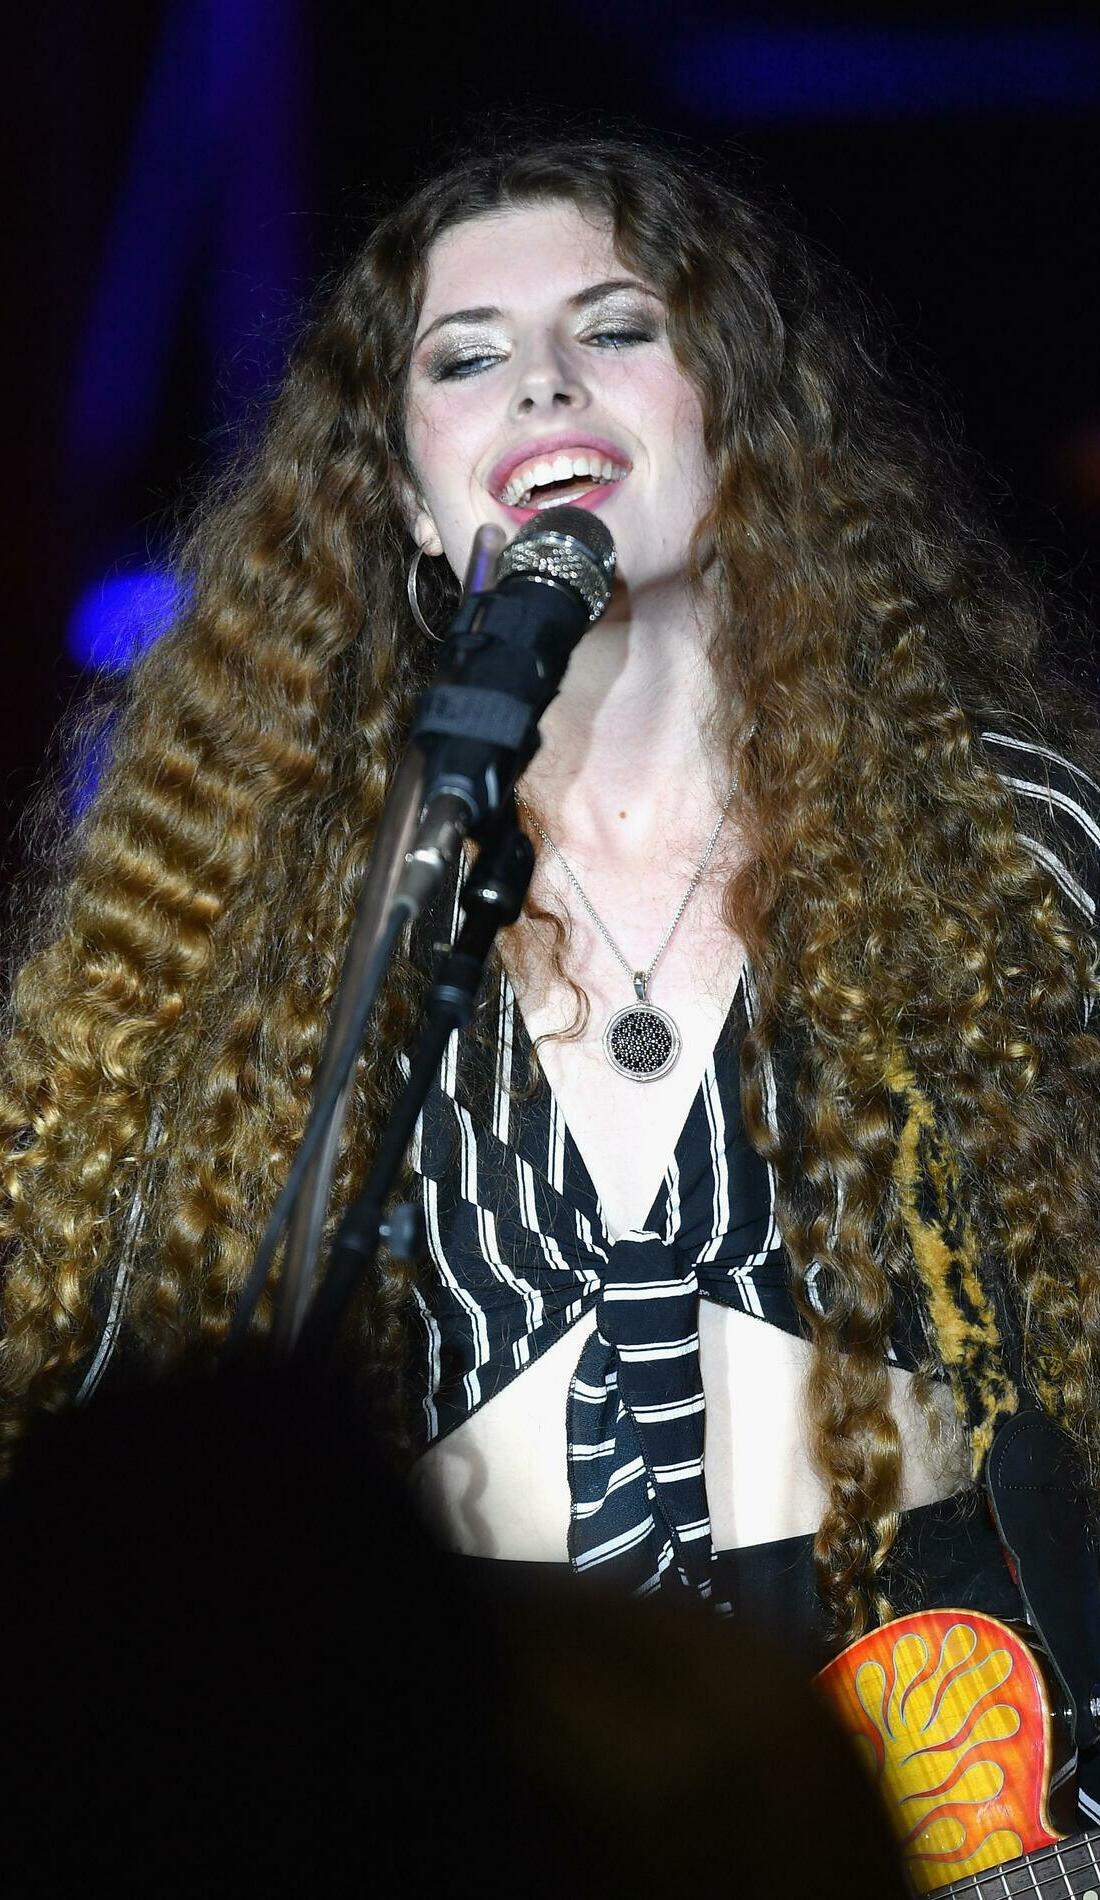 A Hannah Wicklund live event